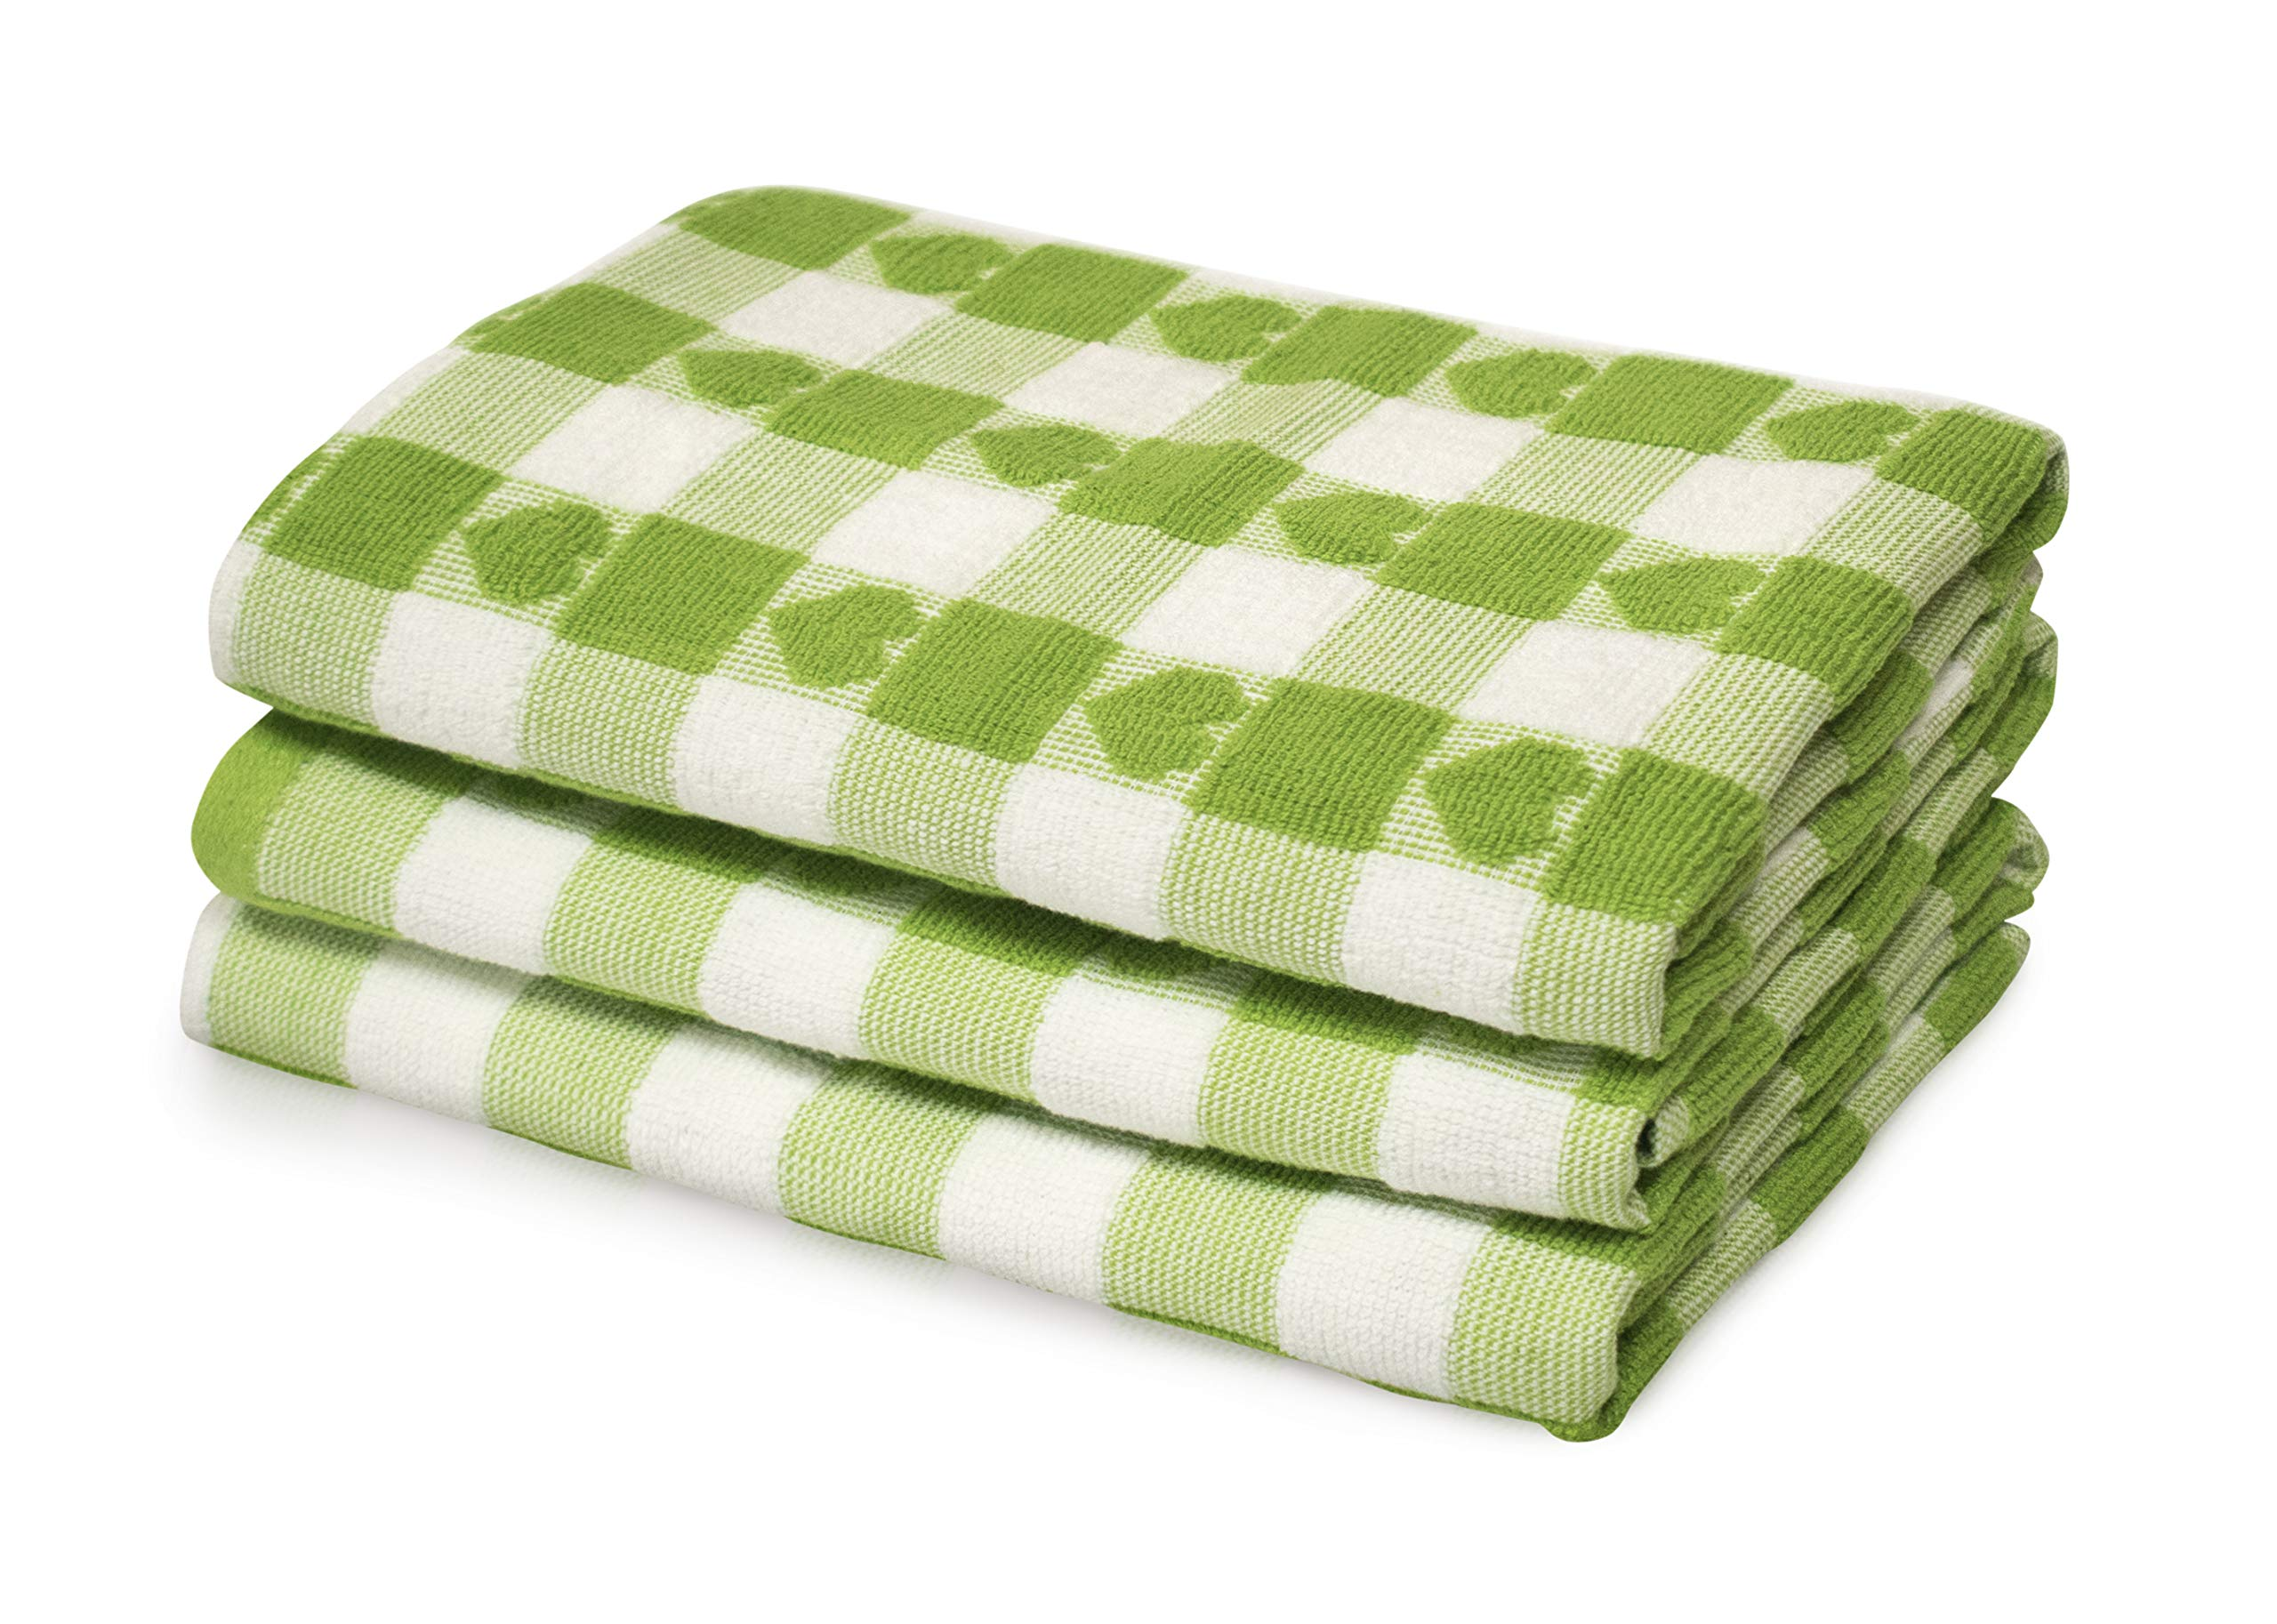 100/%Cotton JUMBO TEA TOWEL Mono Check Terry Towels Large Size Super Absorbent UK